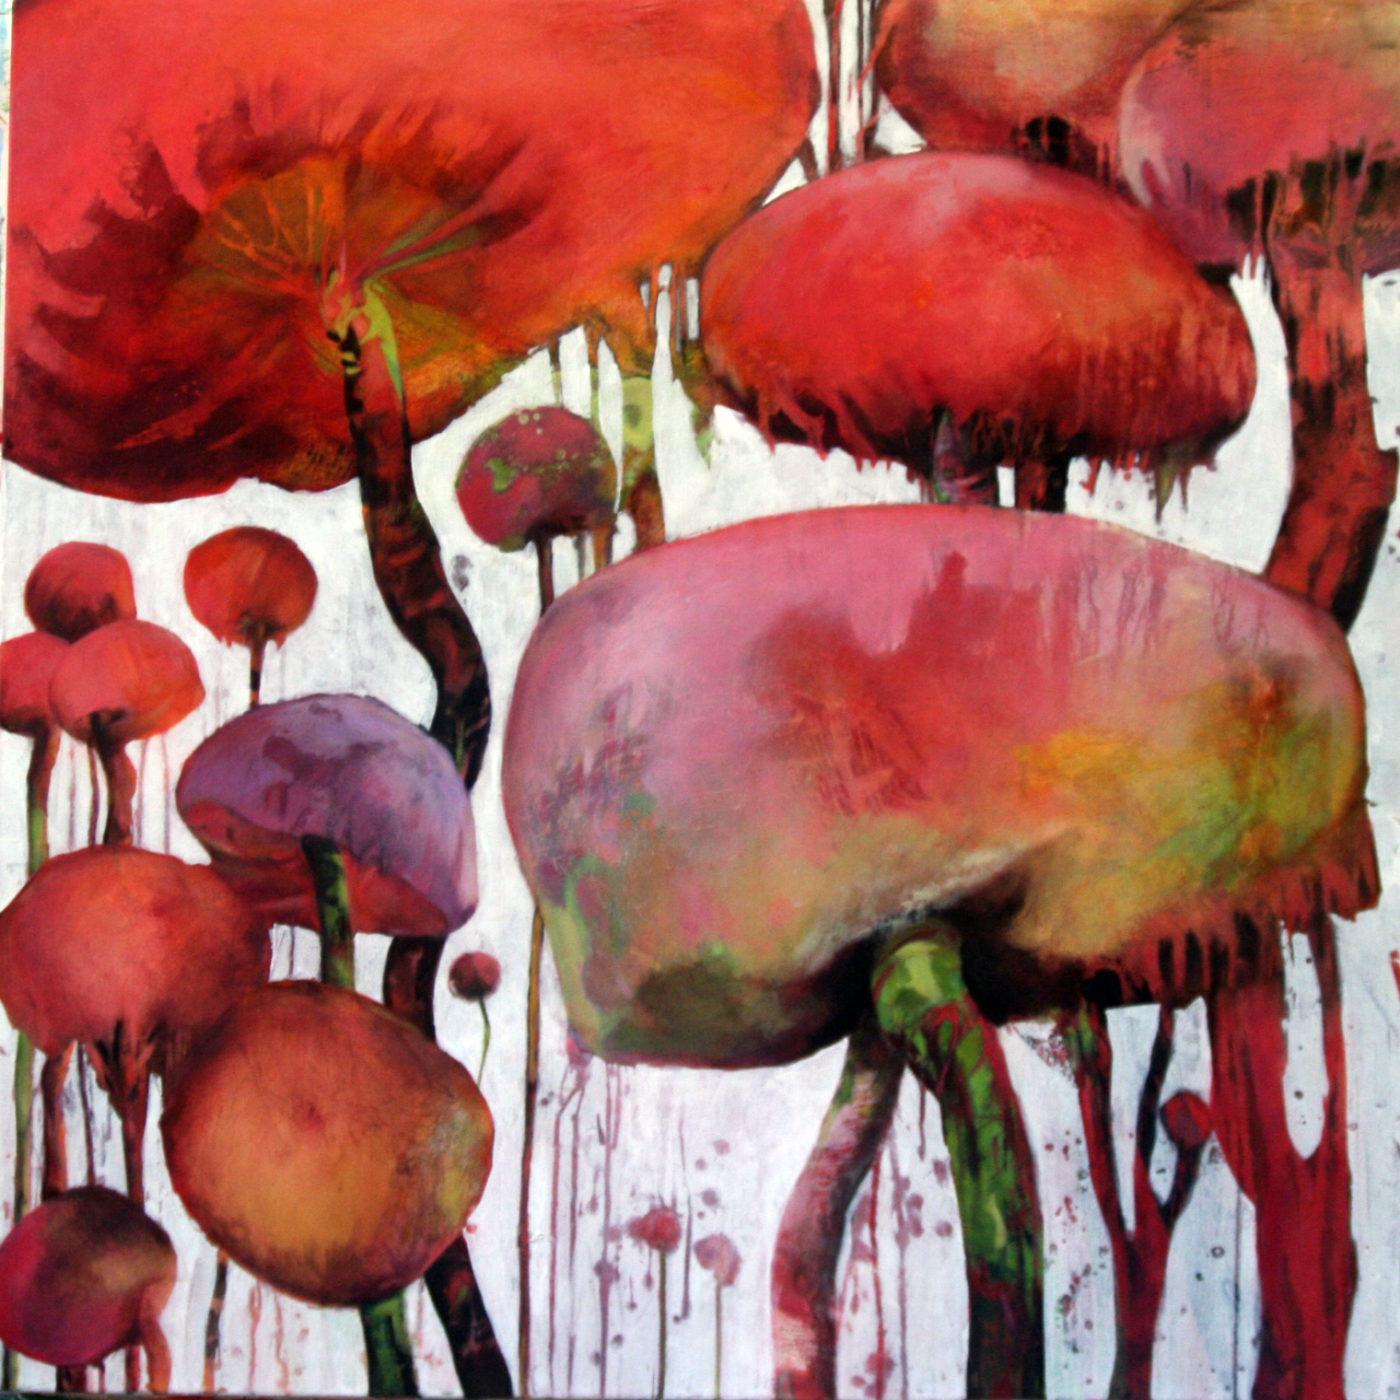 Natura von Sylvia Heuser